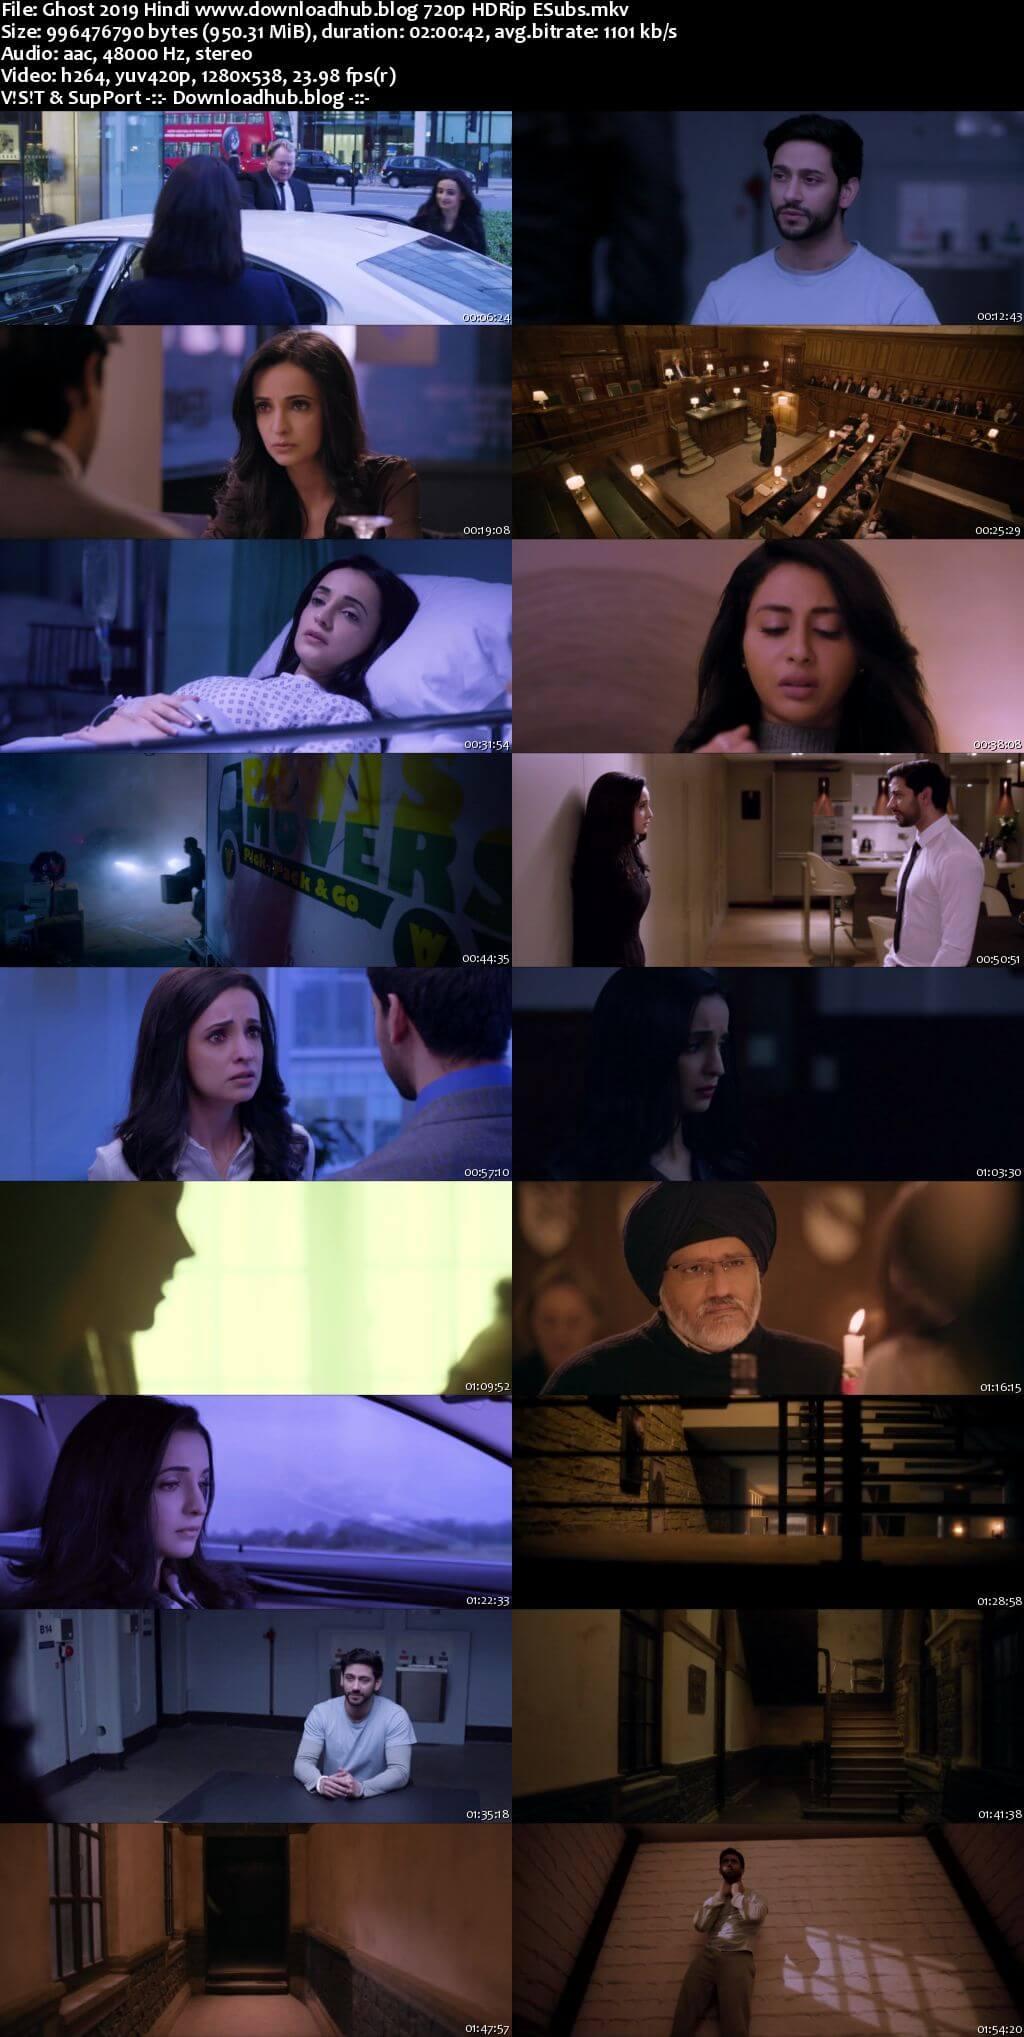 Ghost 2019 Hindi 720p HDRip ESubs